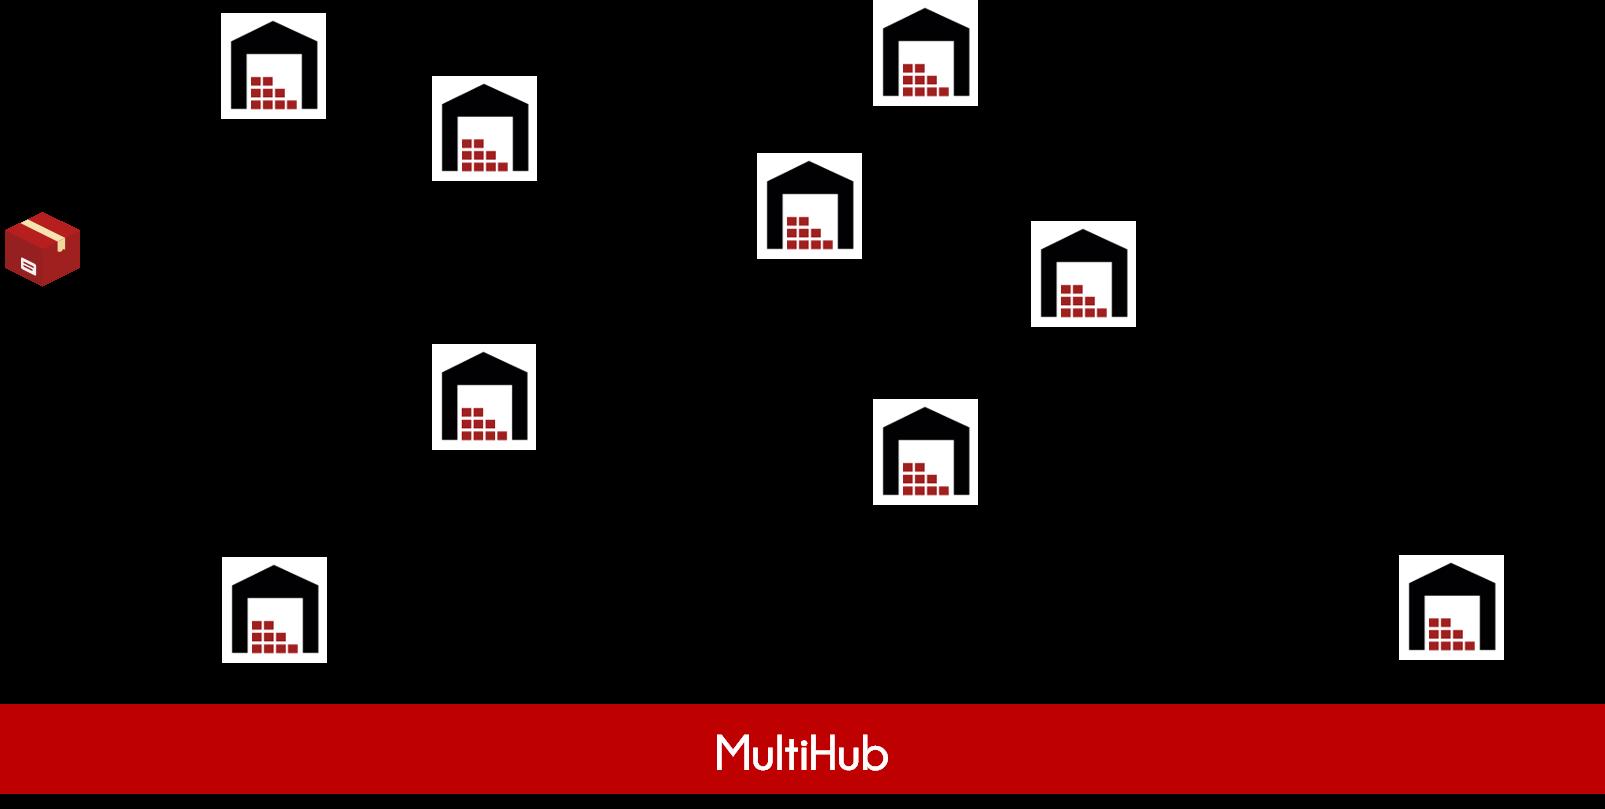 multihub_red